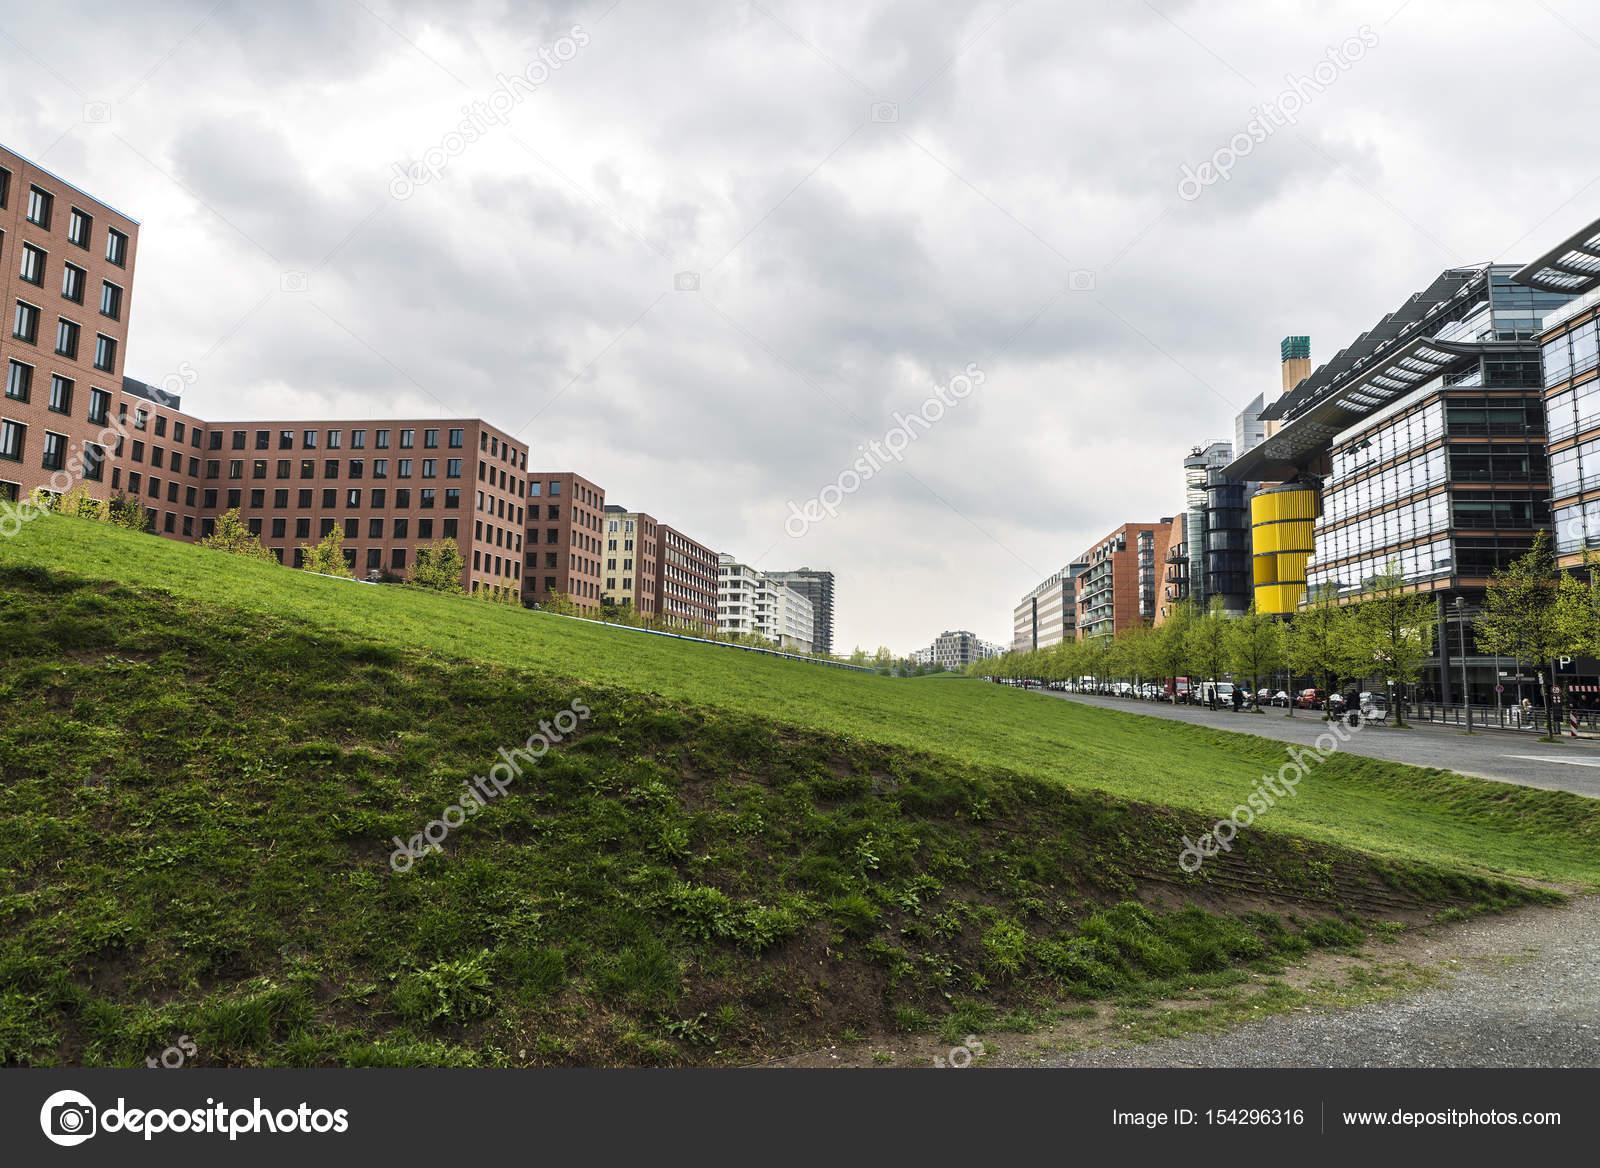 Moderni edifici di appartamenti e uffici a berlino for Immagini di appartamenti moderni